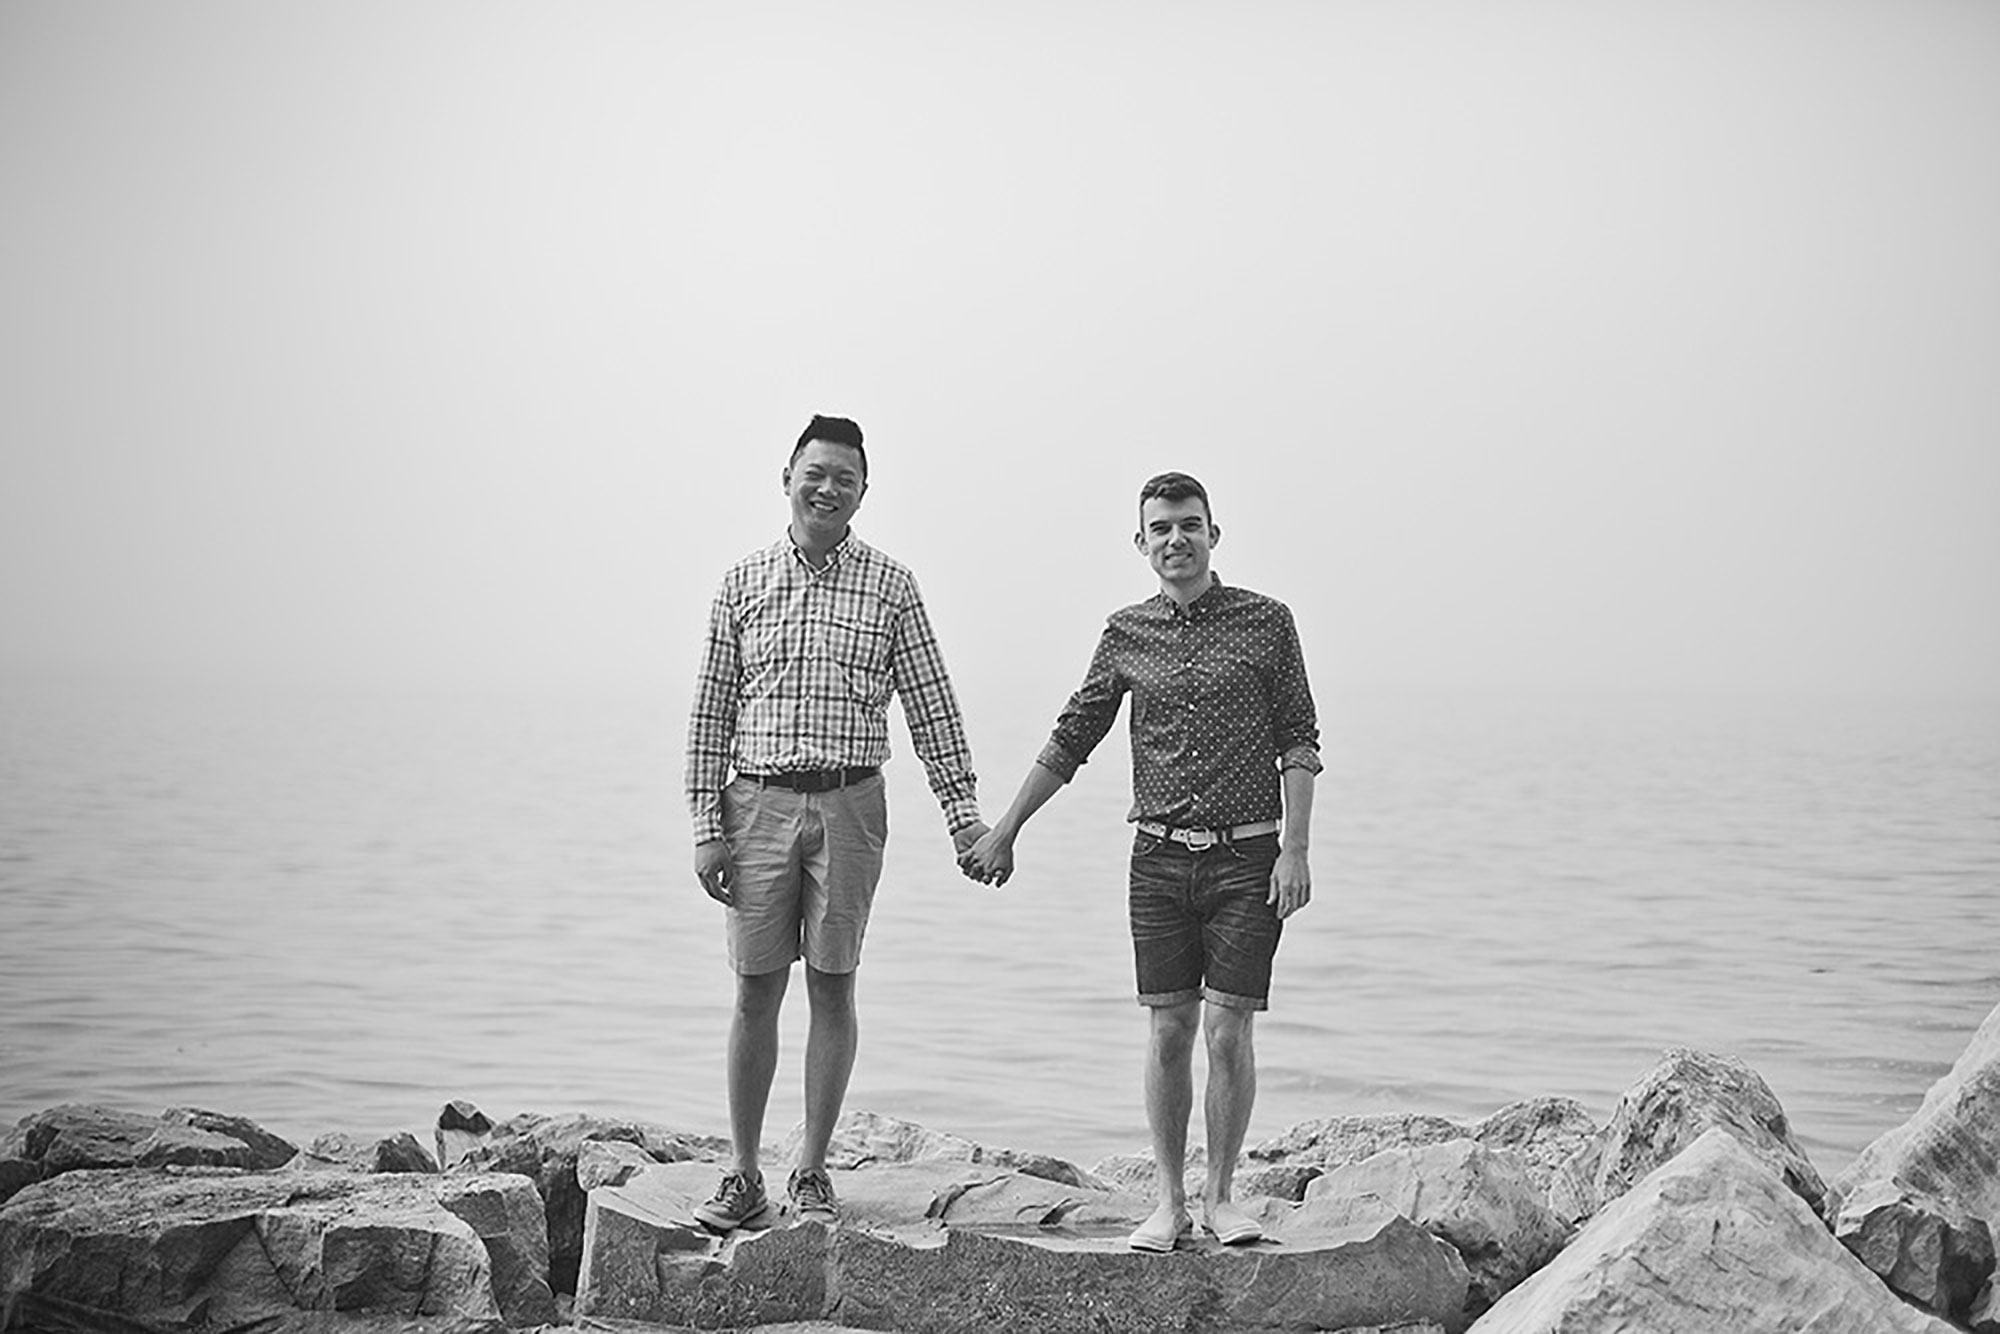 Jordan-Beach-Engagement-Vineyard-Bride-Photo-By-Foxglove-Photography-001.jpg